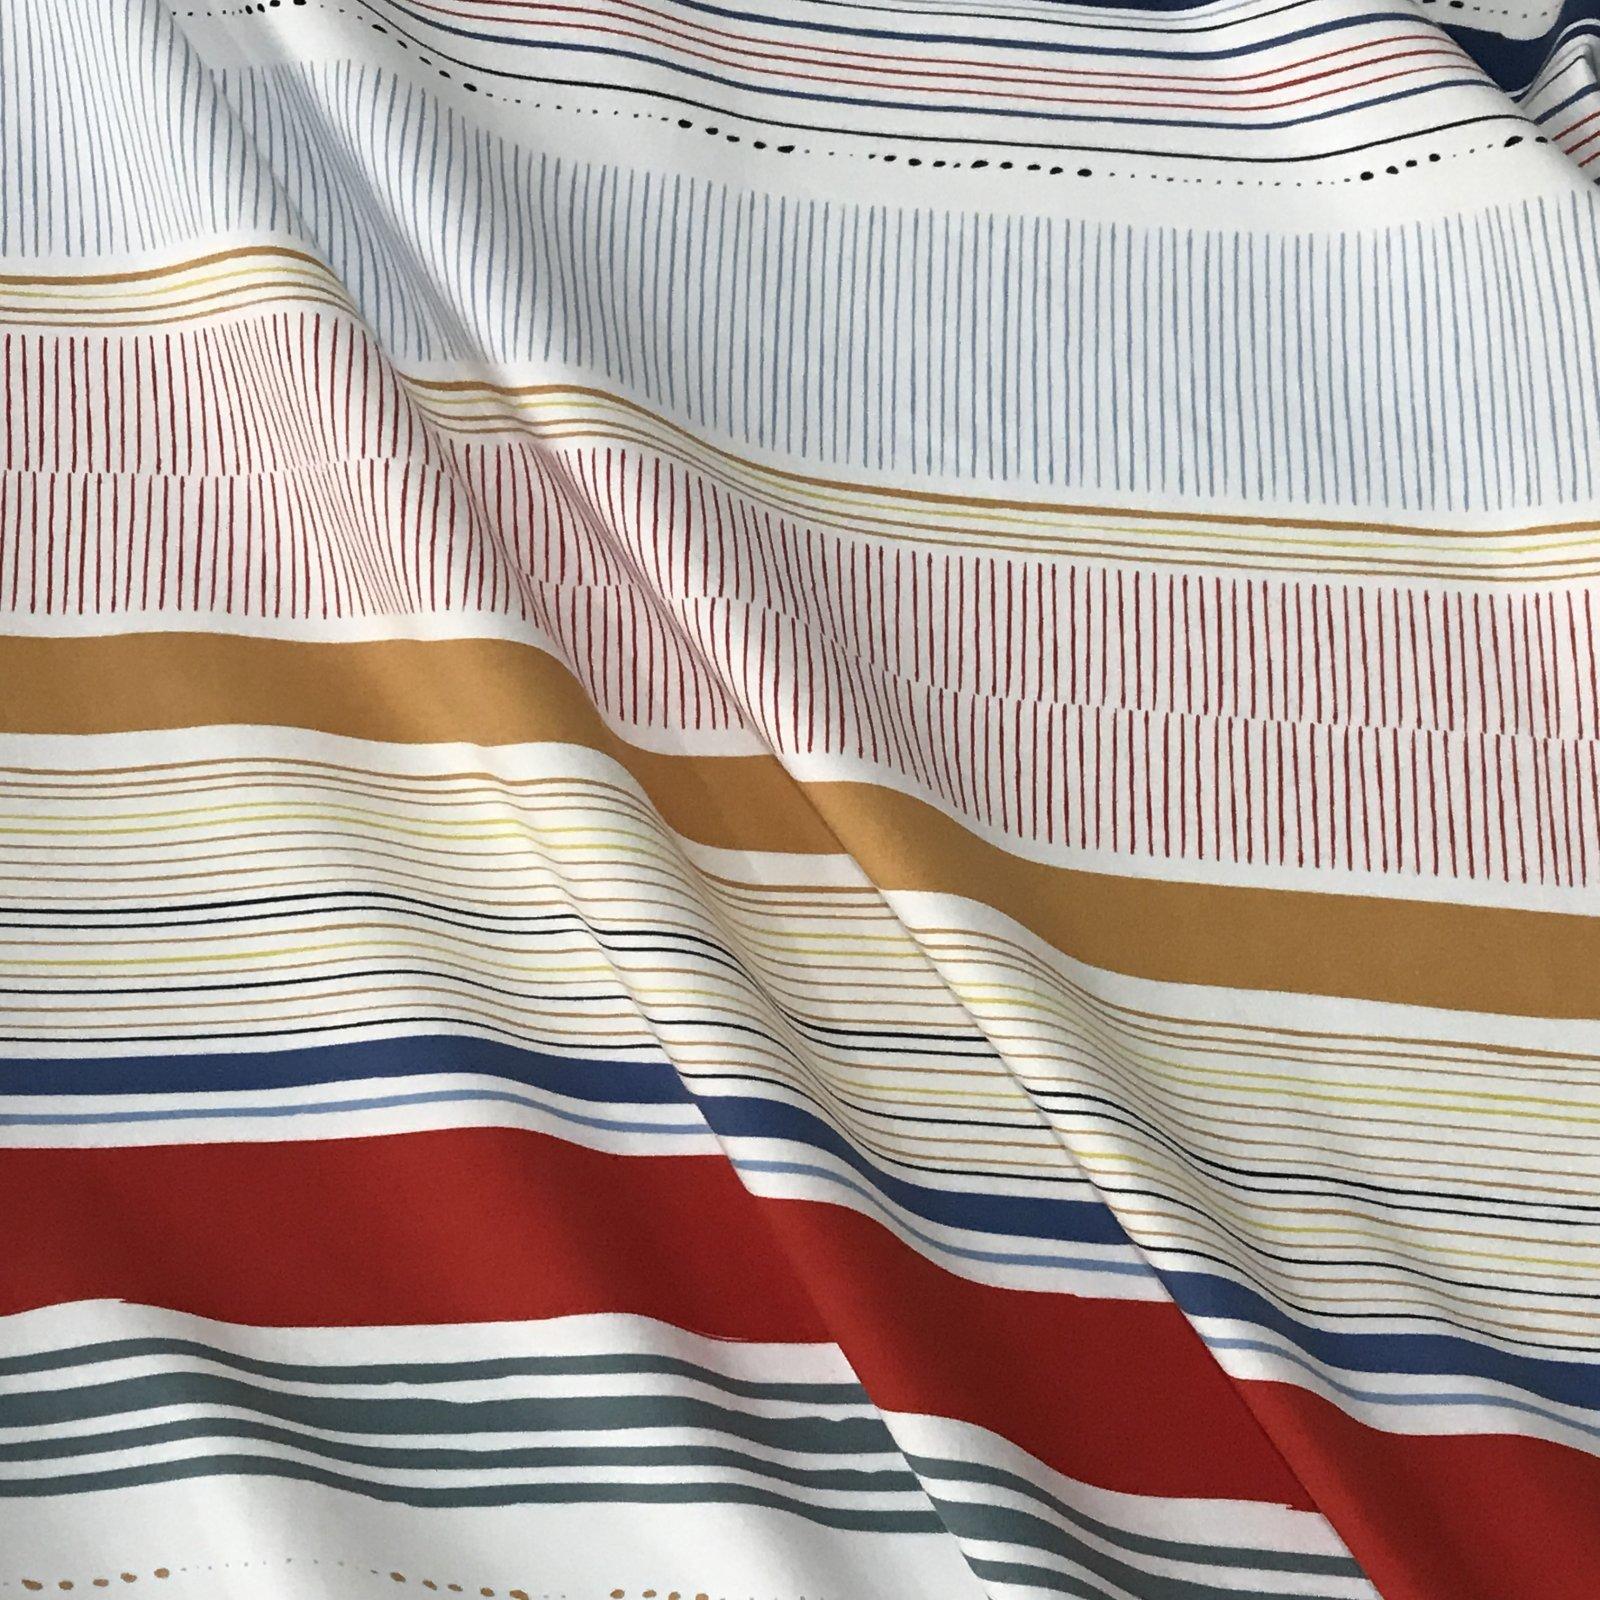 Cotton Knit -   A Line Study